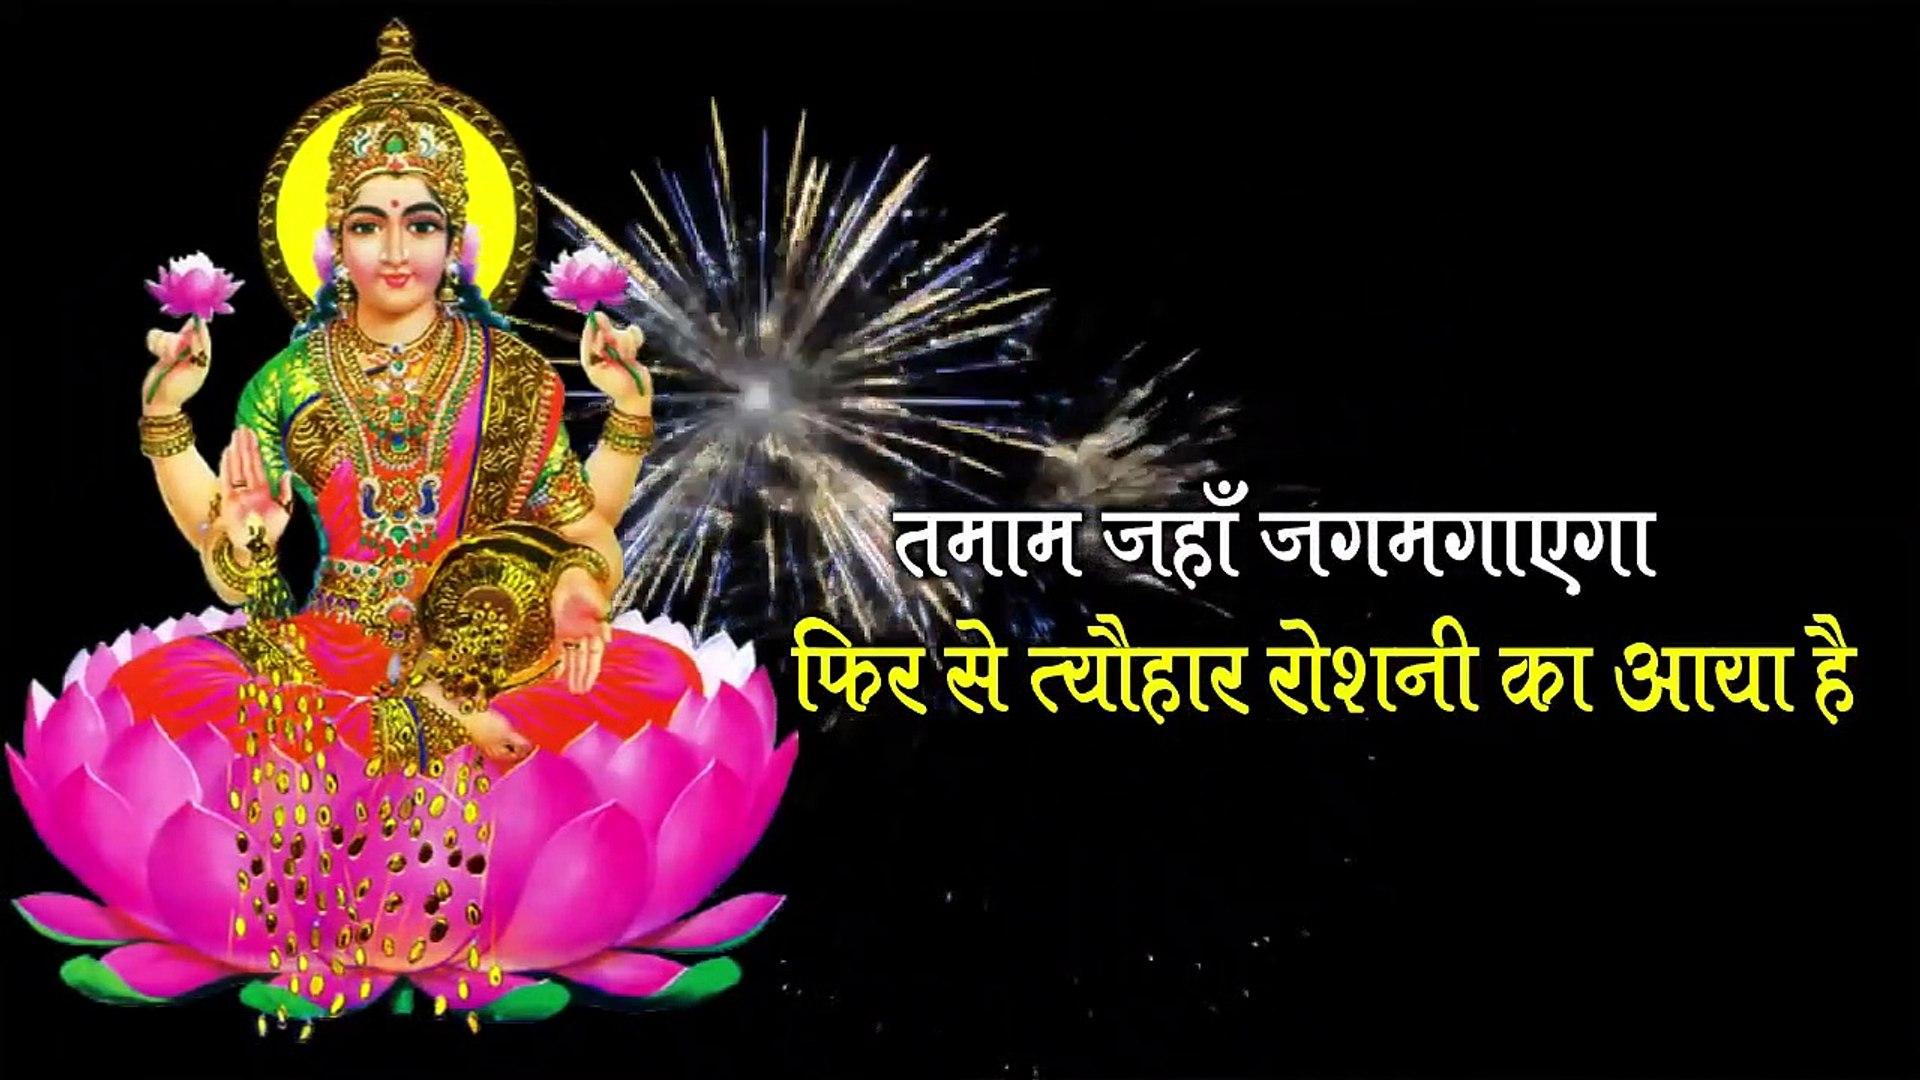 Diwali whatsapp status video    Diwali whatsapp status    best Diwali status 2018